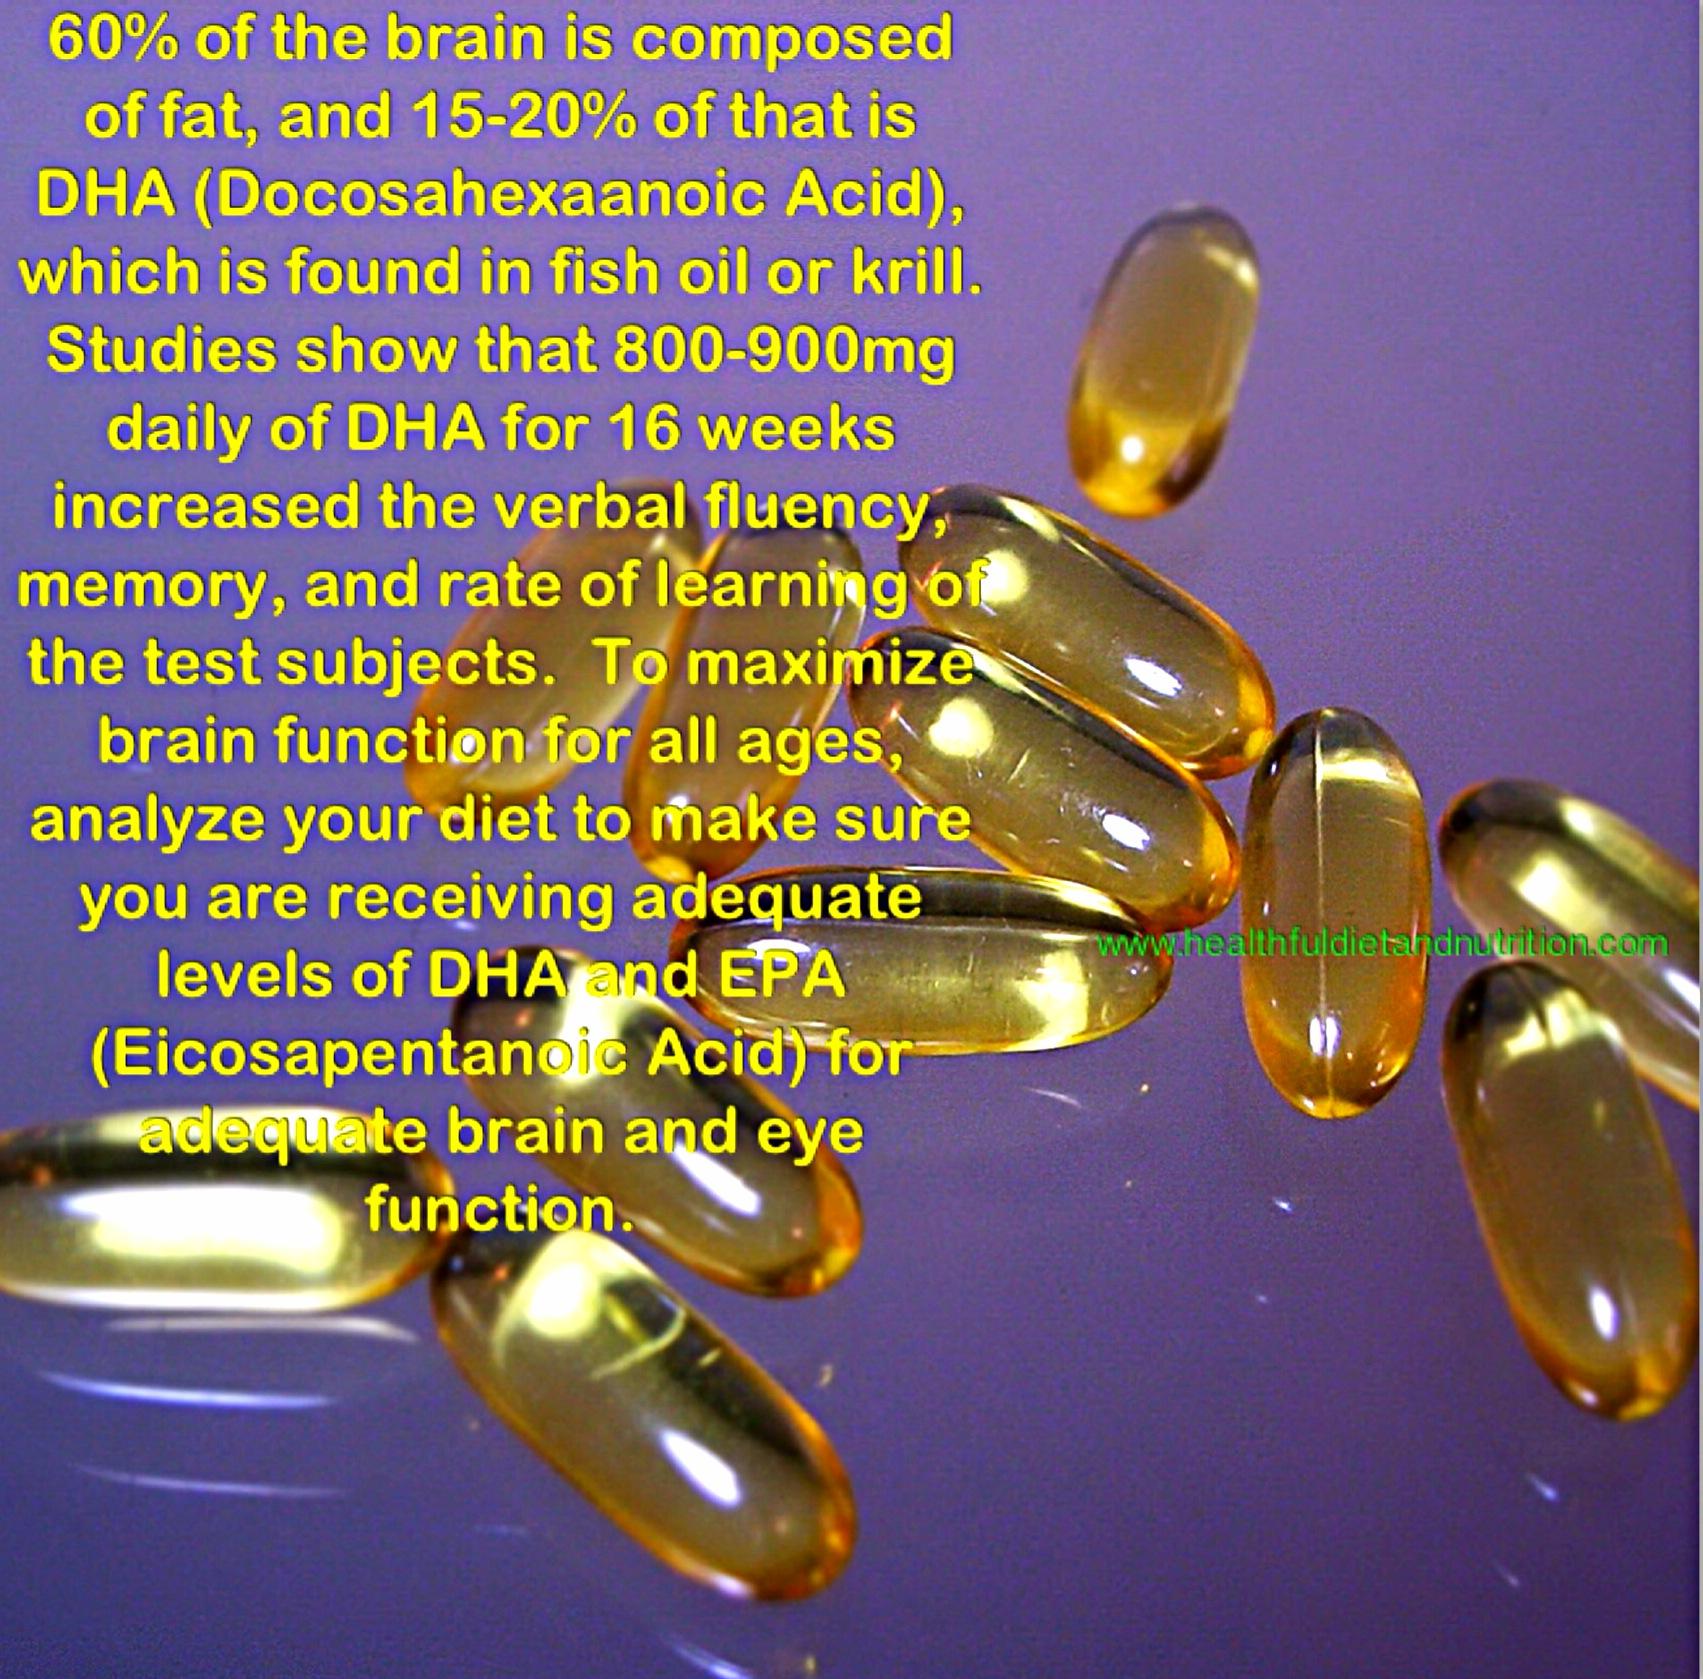 Brain Health and Fish Oil (DHA)